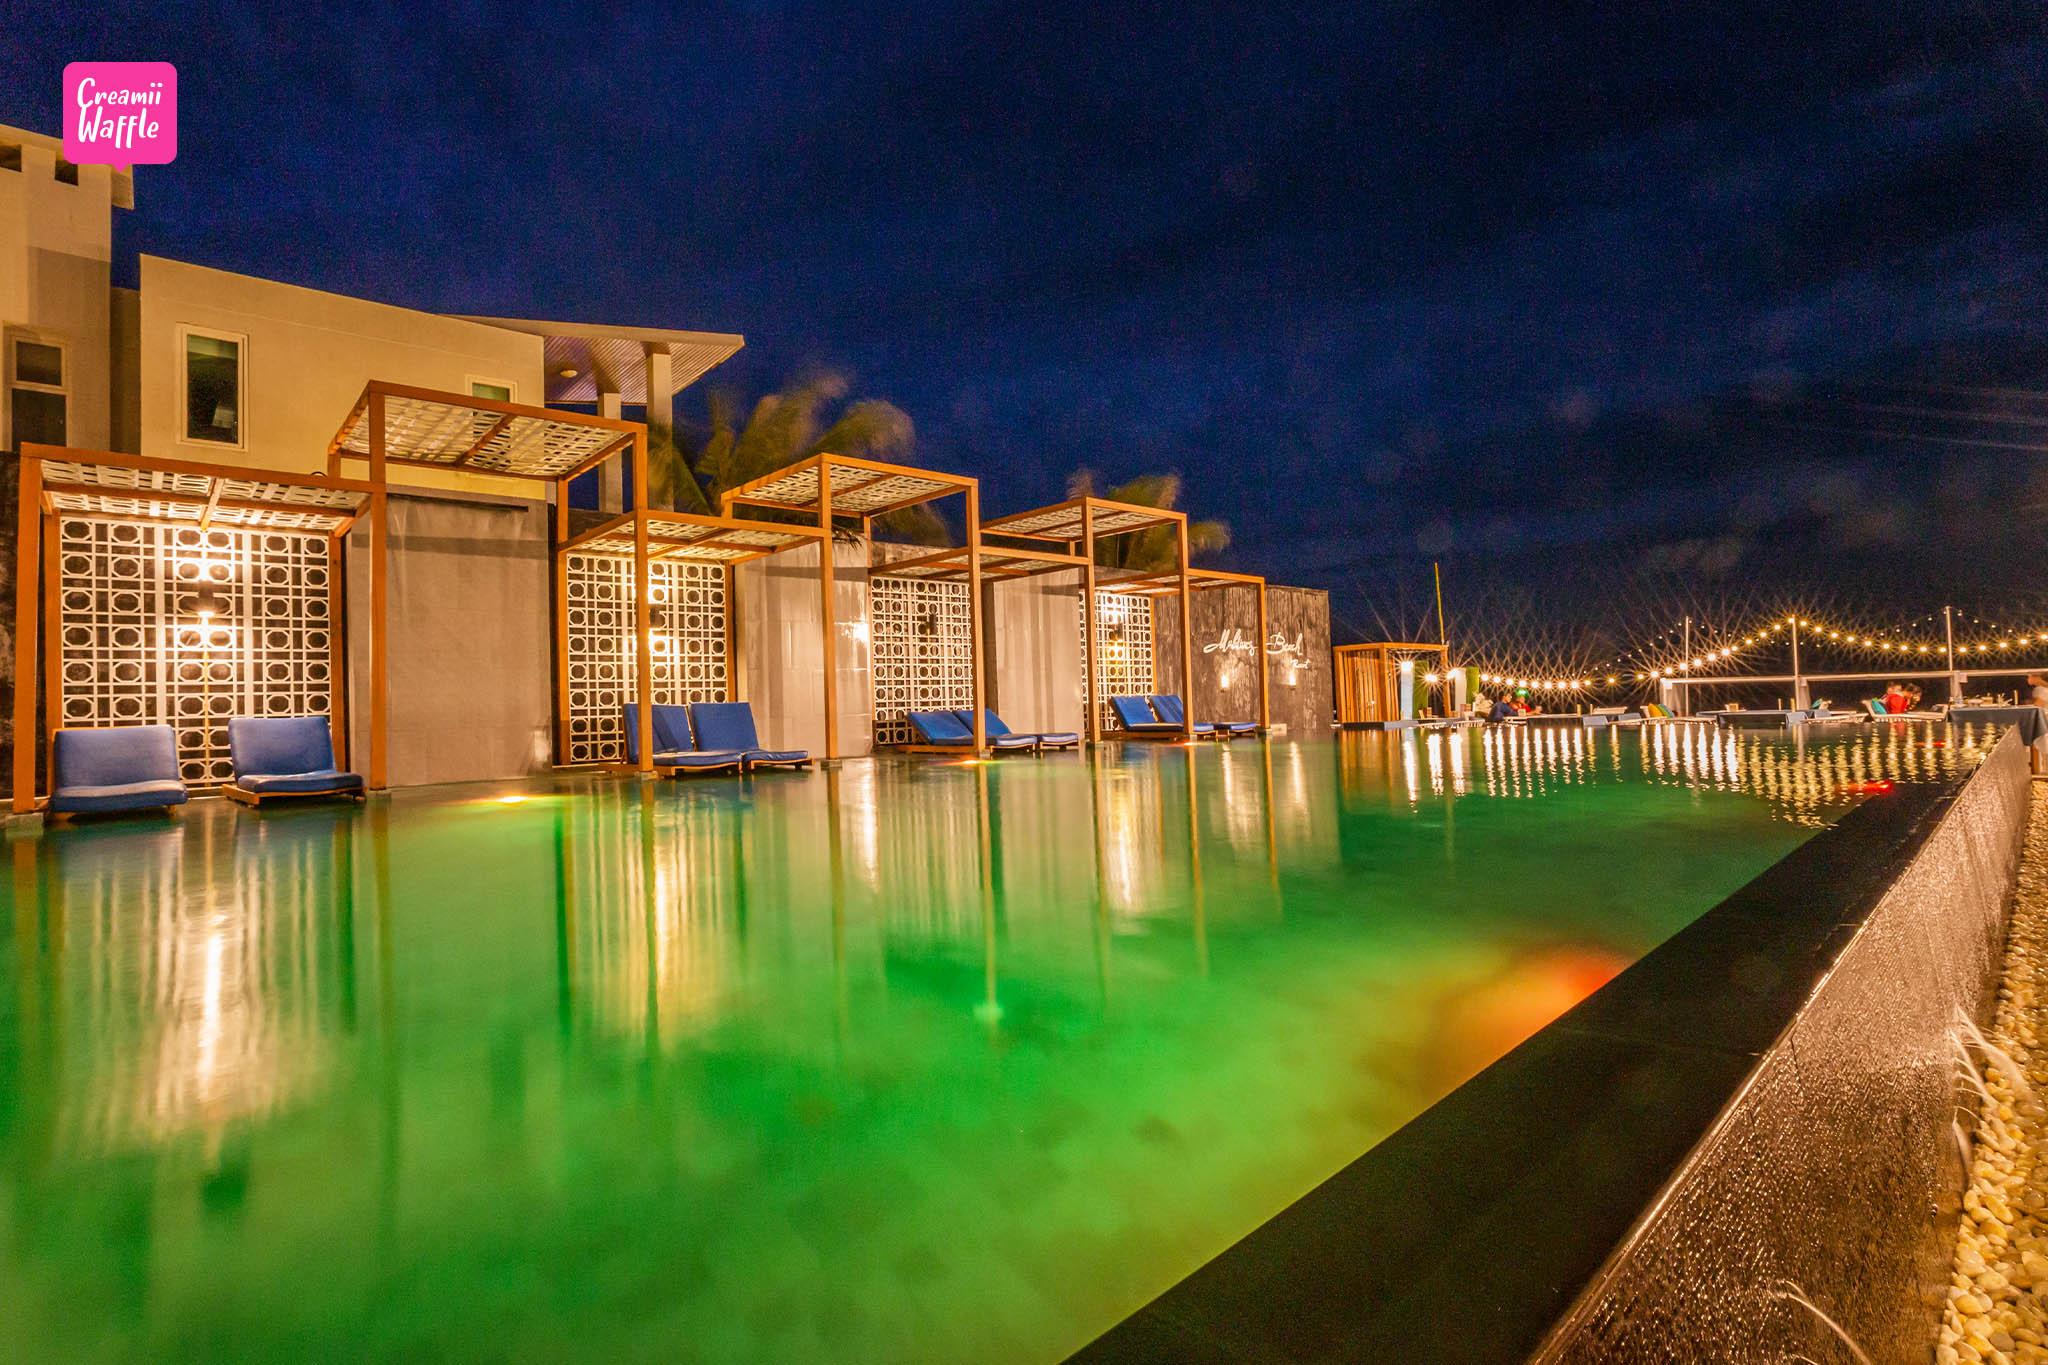 Maldives Beach Resort Chanthaburi มัลดีฟส์ บีช รีสอร์ท จันทบุรี ที่พักติดทะเล